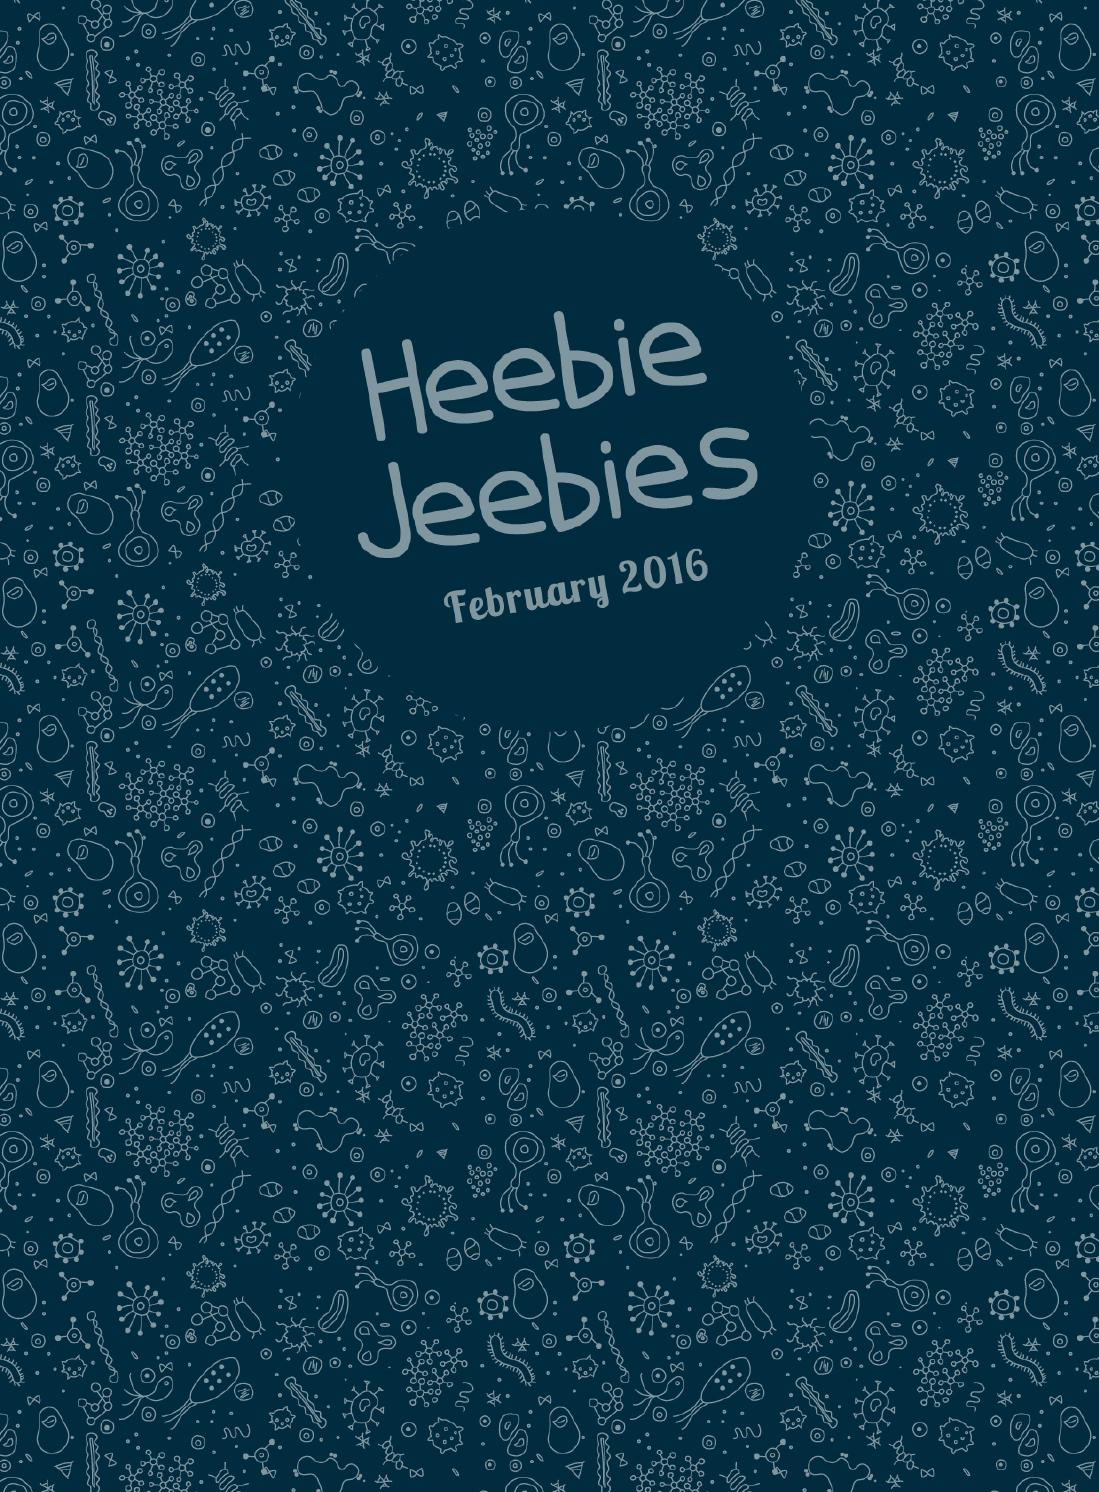 Heebie Jeebies Fitzroy/'s Teardrop Storm Glass Historical Weather Forecast Device